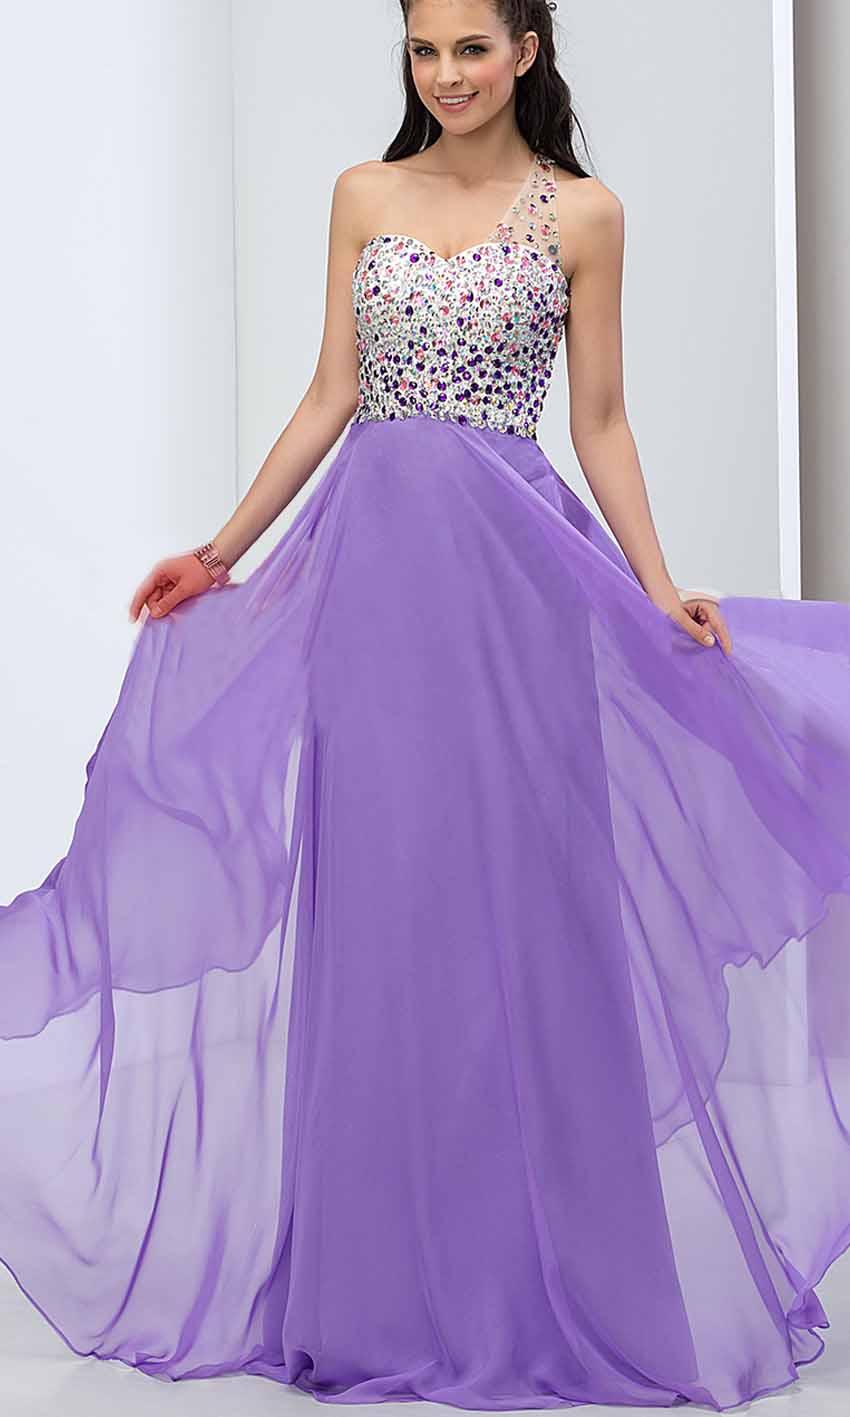 Purple Jeweled Lace One Shoulder Long Prom Dresses UK KSP393 [KSP393 ...